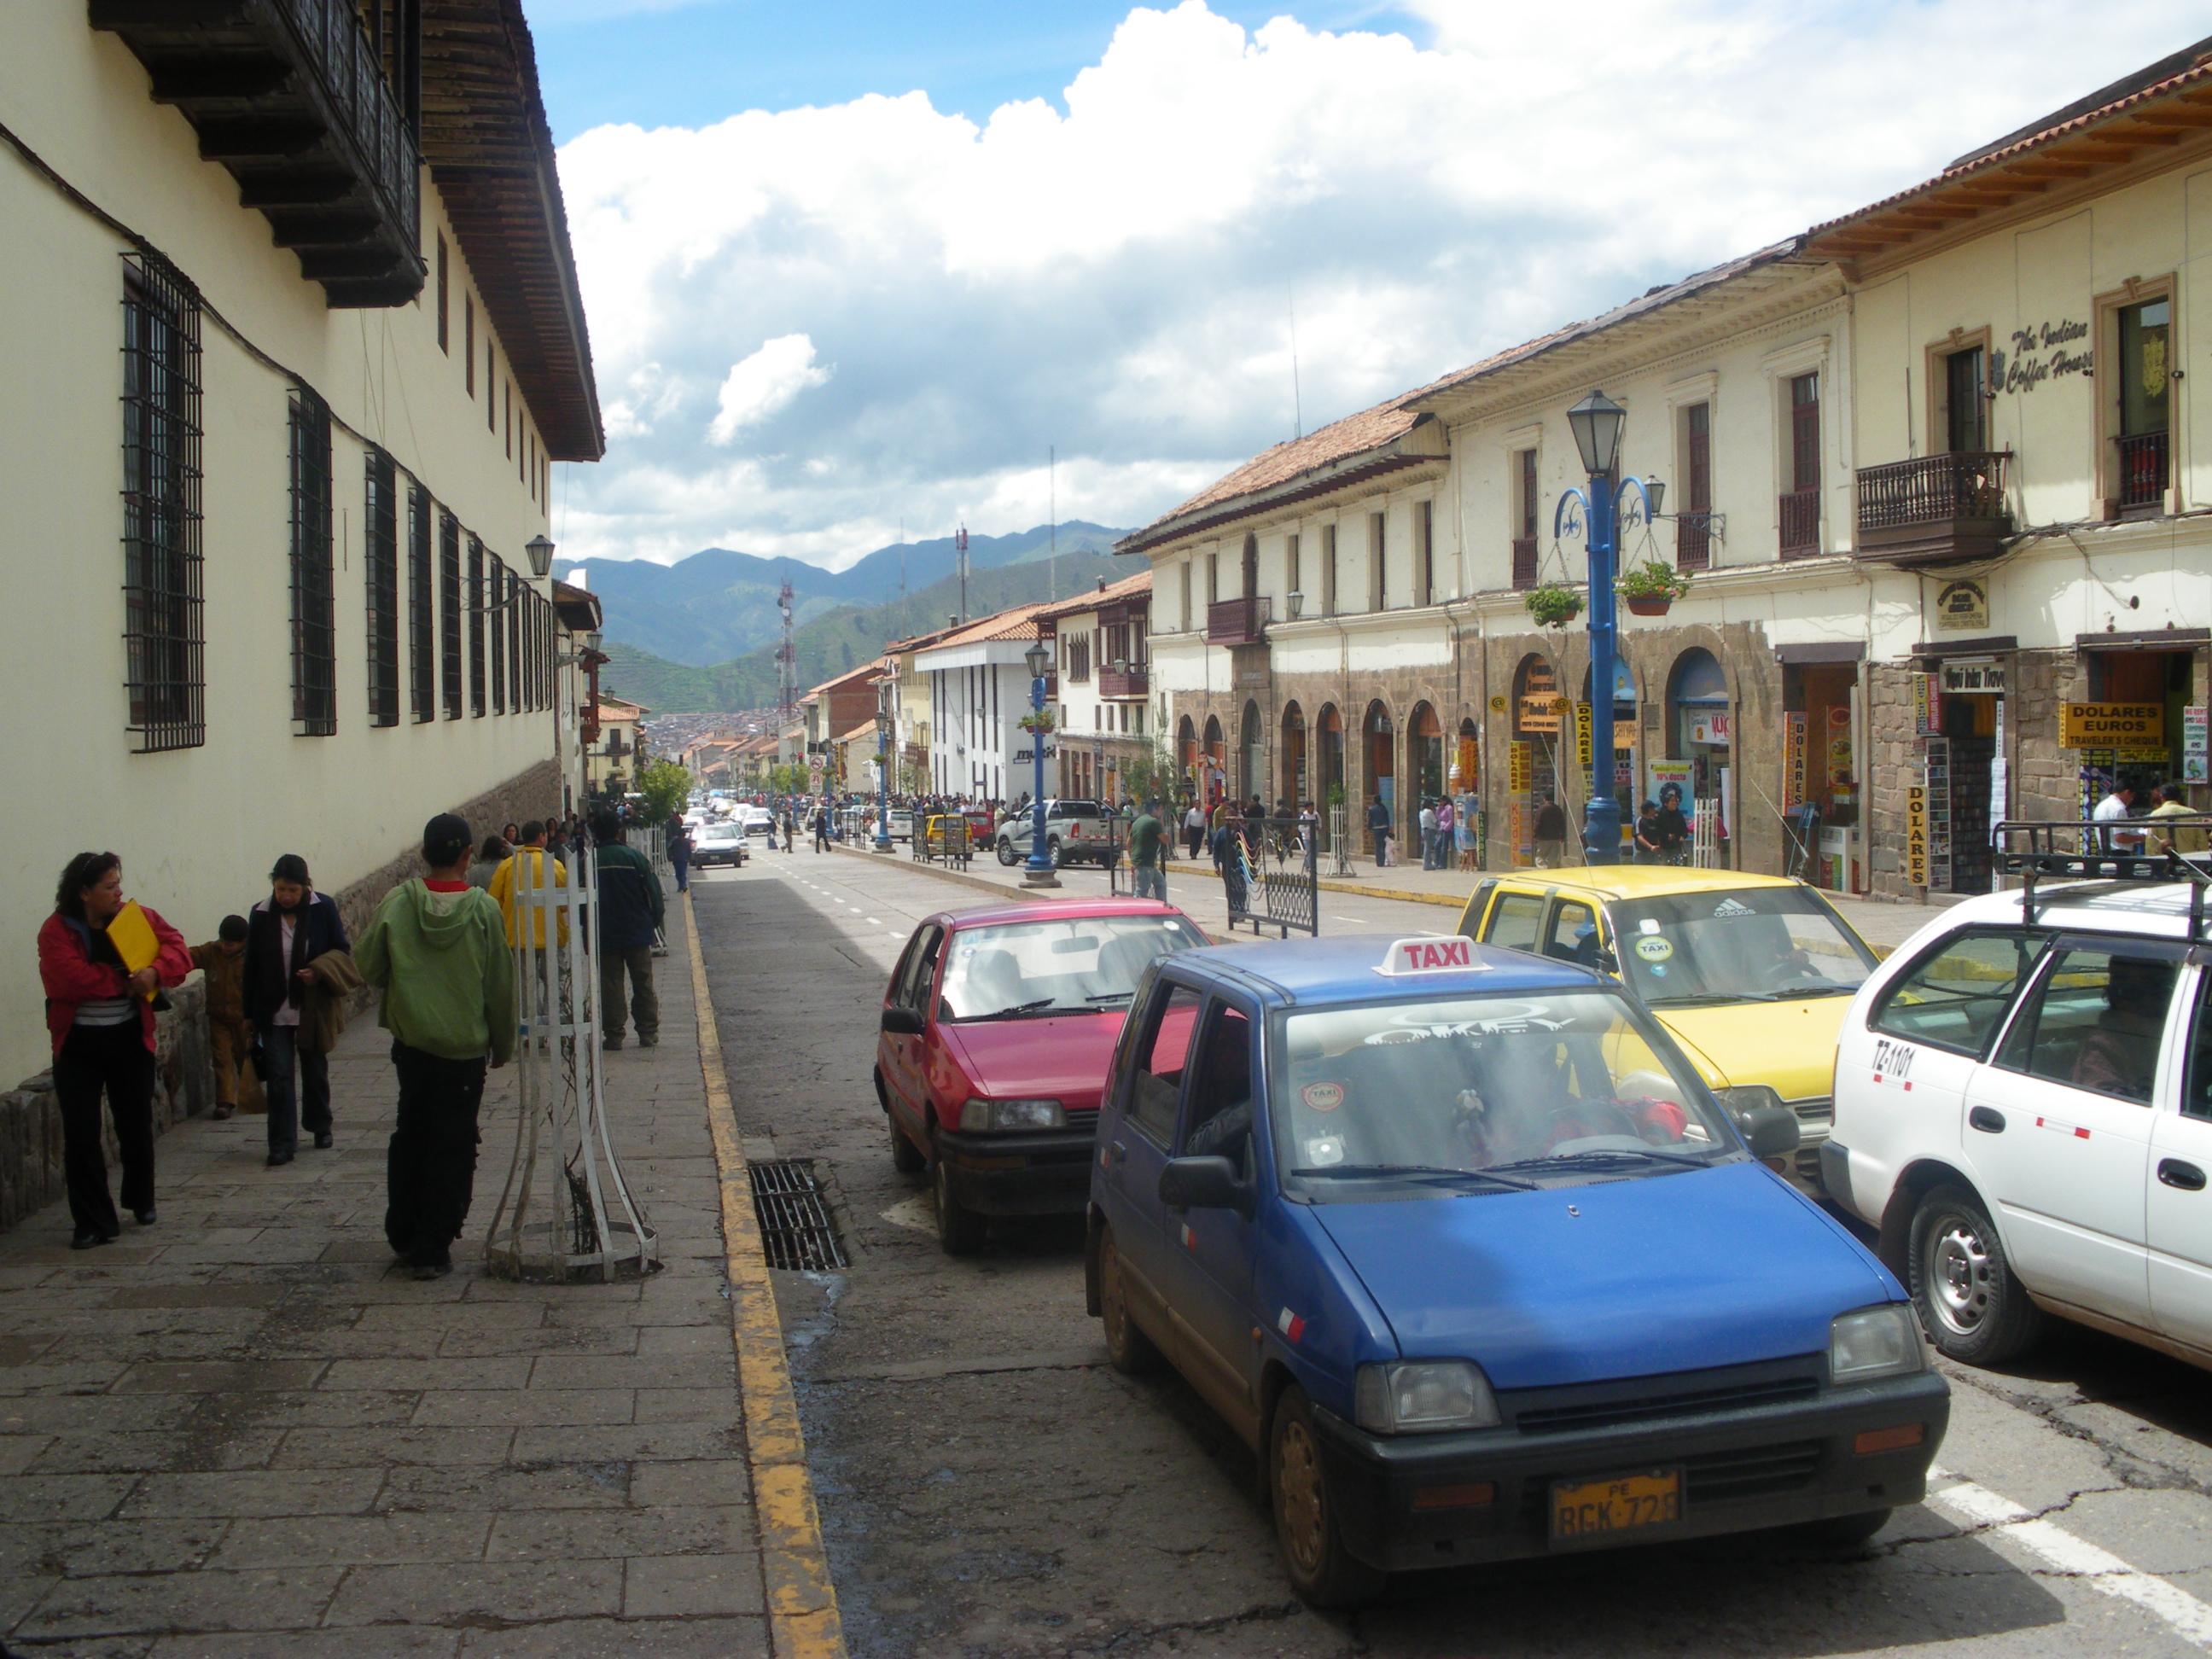 Avenida Del Sol, the busiest street in downtown Cusco.